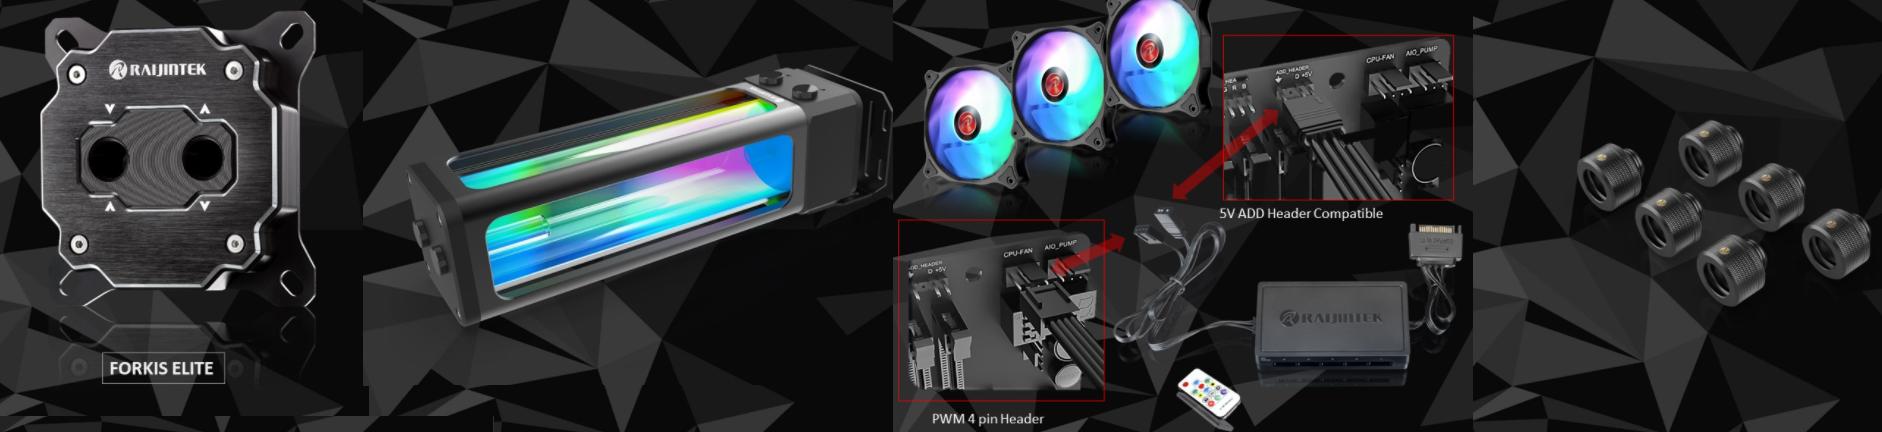 Raijintek présente ses nouveaux kit watercooling custom CA240/CA360